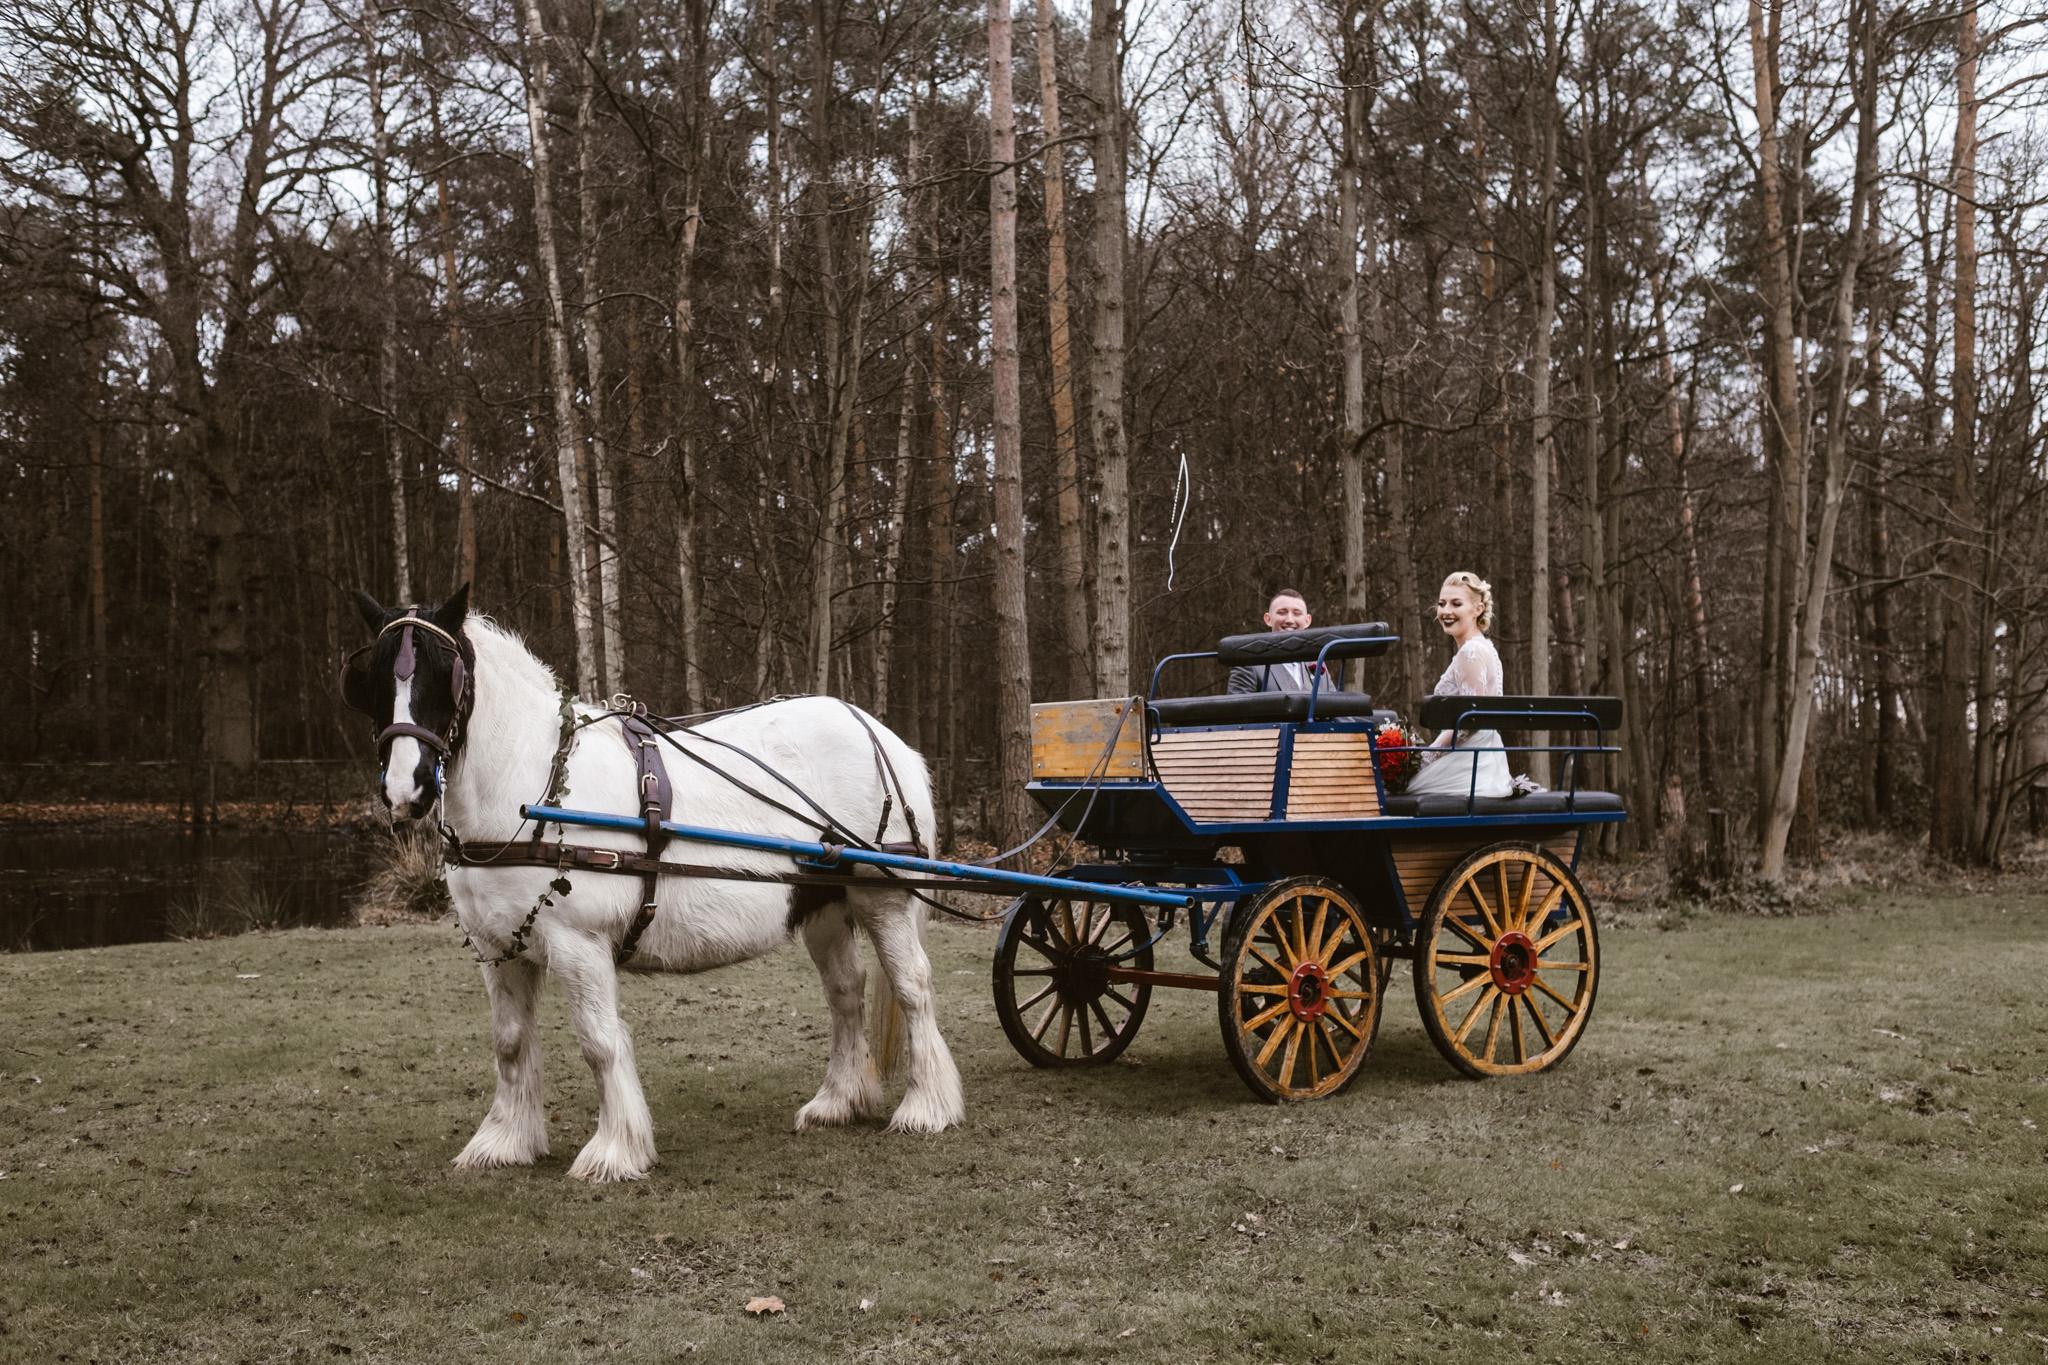 Captains-Wood-Barn-Alterative-Rustic-Vintage-Essex-Wedding-Suffolk-Grace-Elizabeth-8.jpg